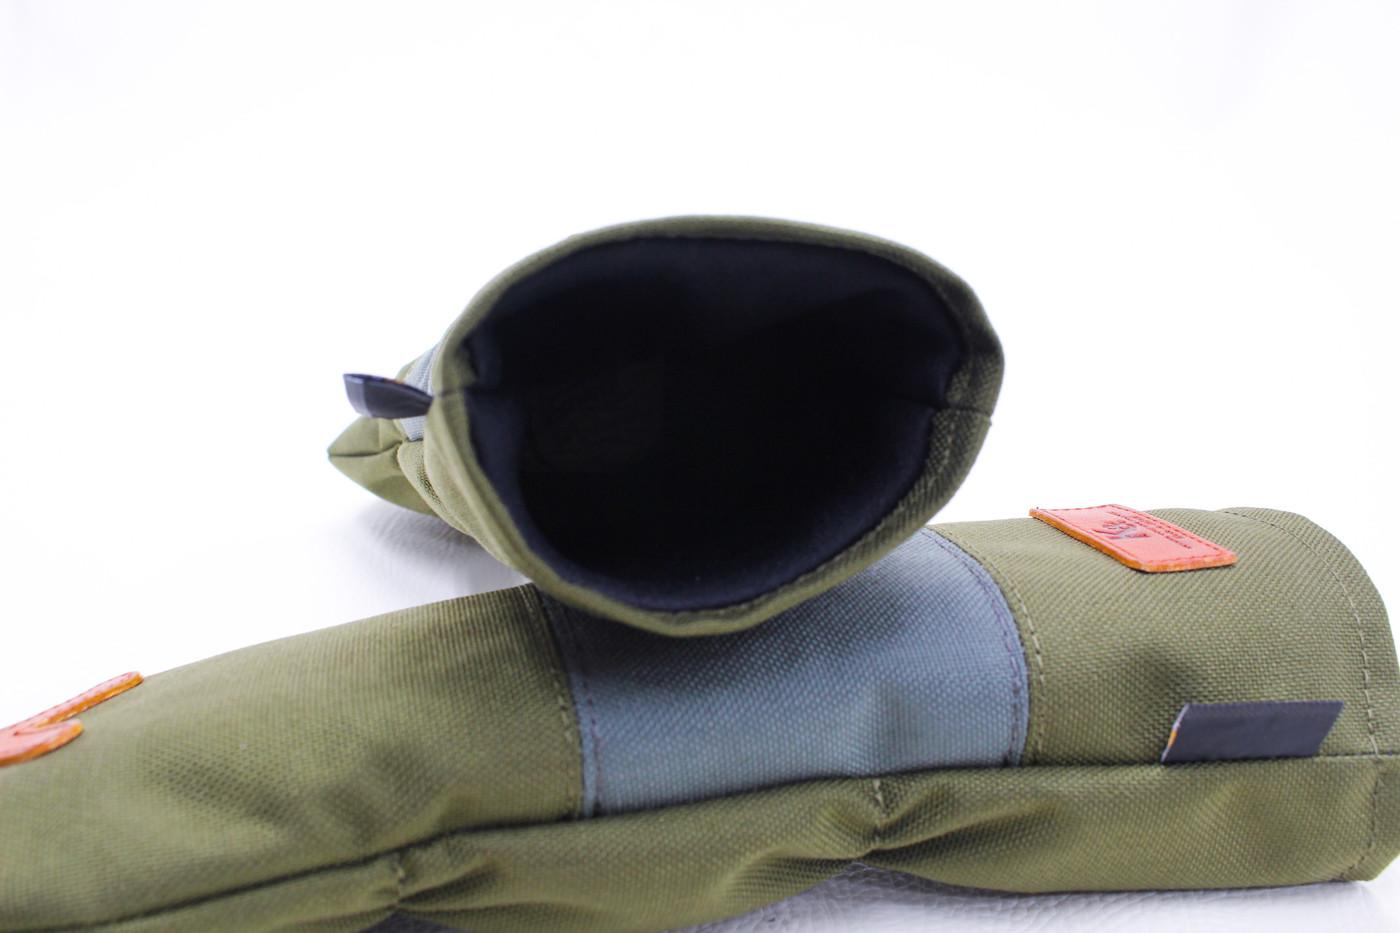 K& HC-Mit COBA ヘッドカバー カーキ、グレー×fieno 内装